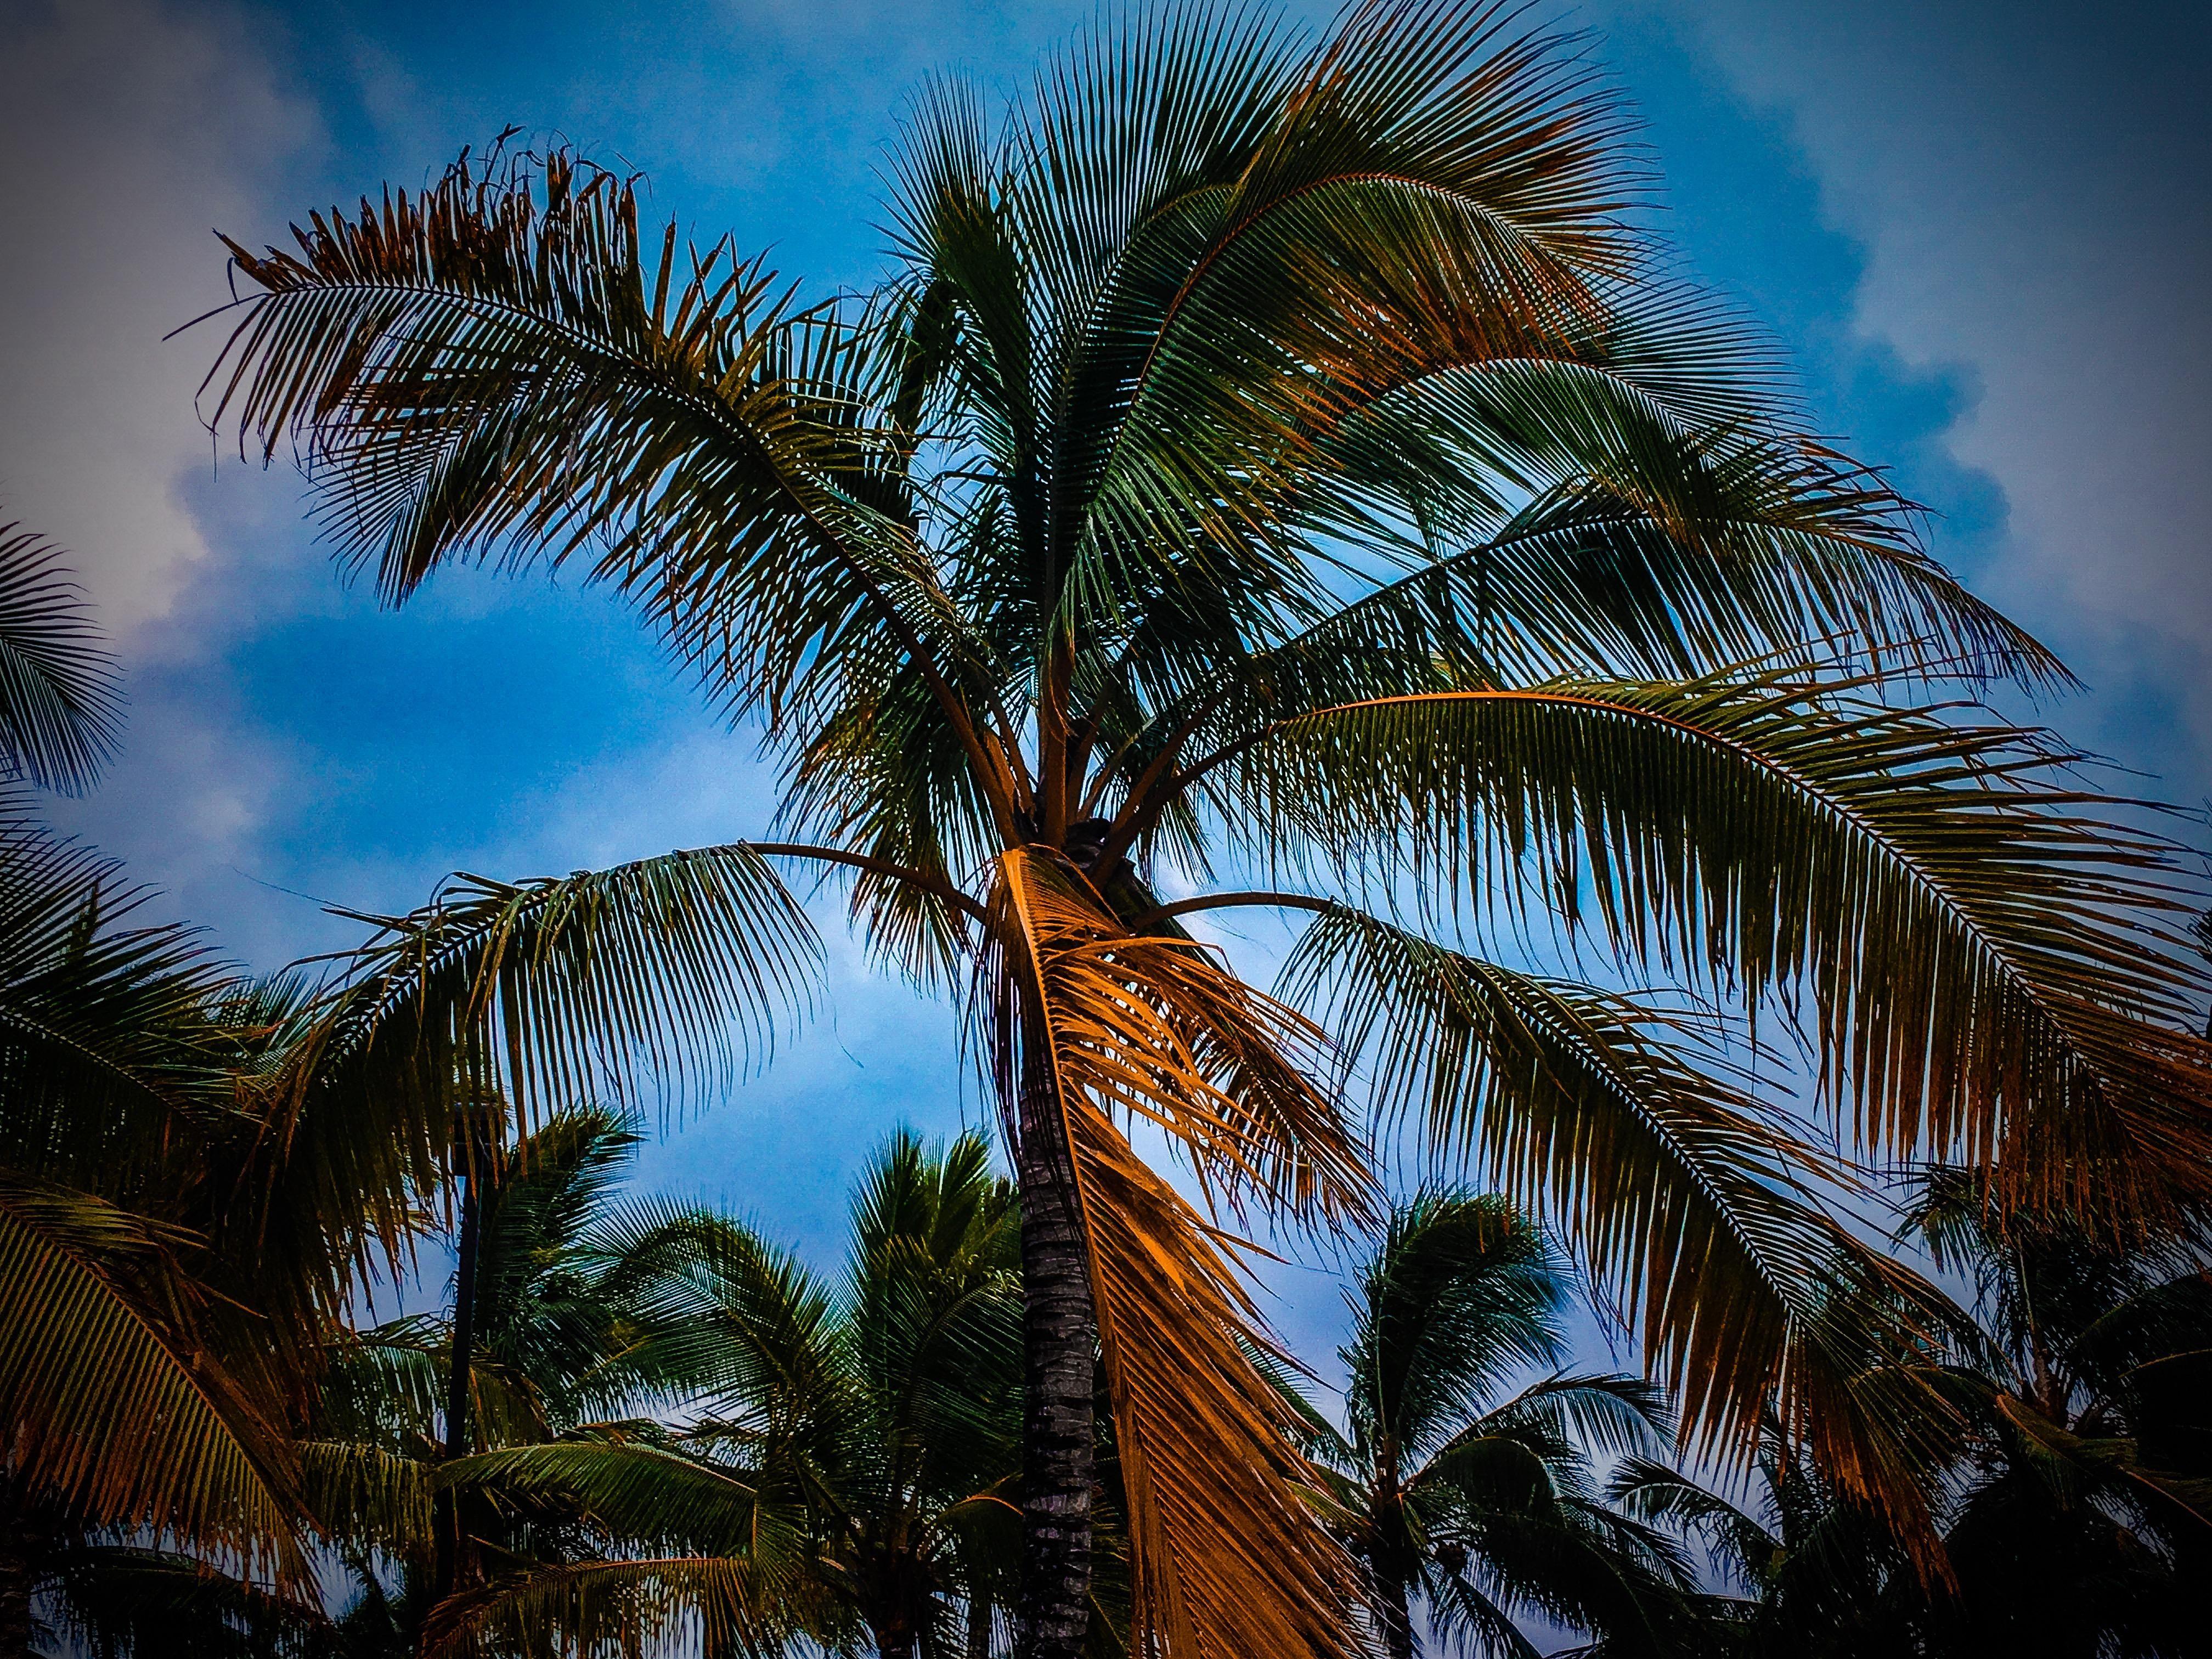 4032x3024] palm trees (oc) [2048x1536] /r/wallpapers want an ipad